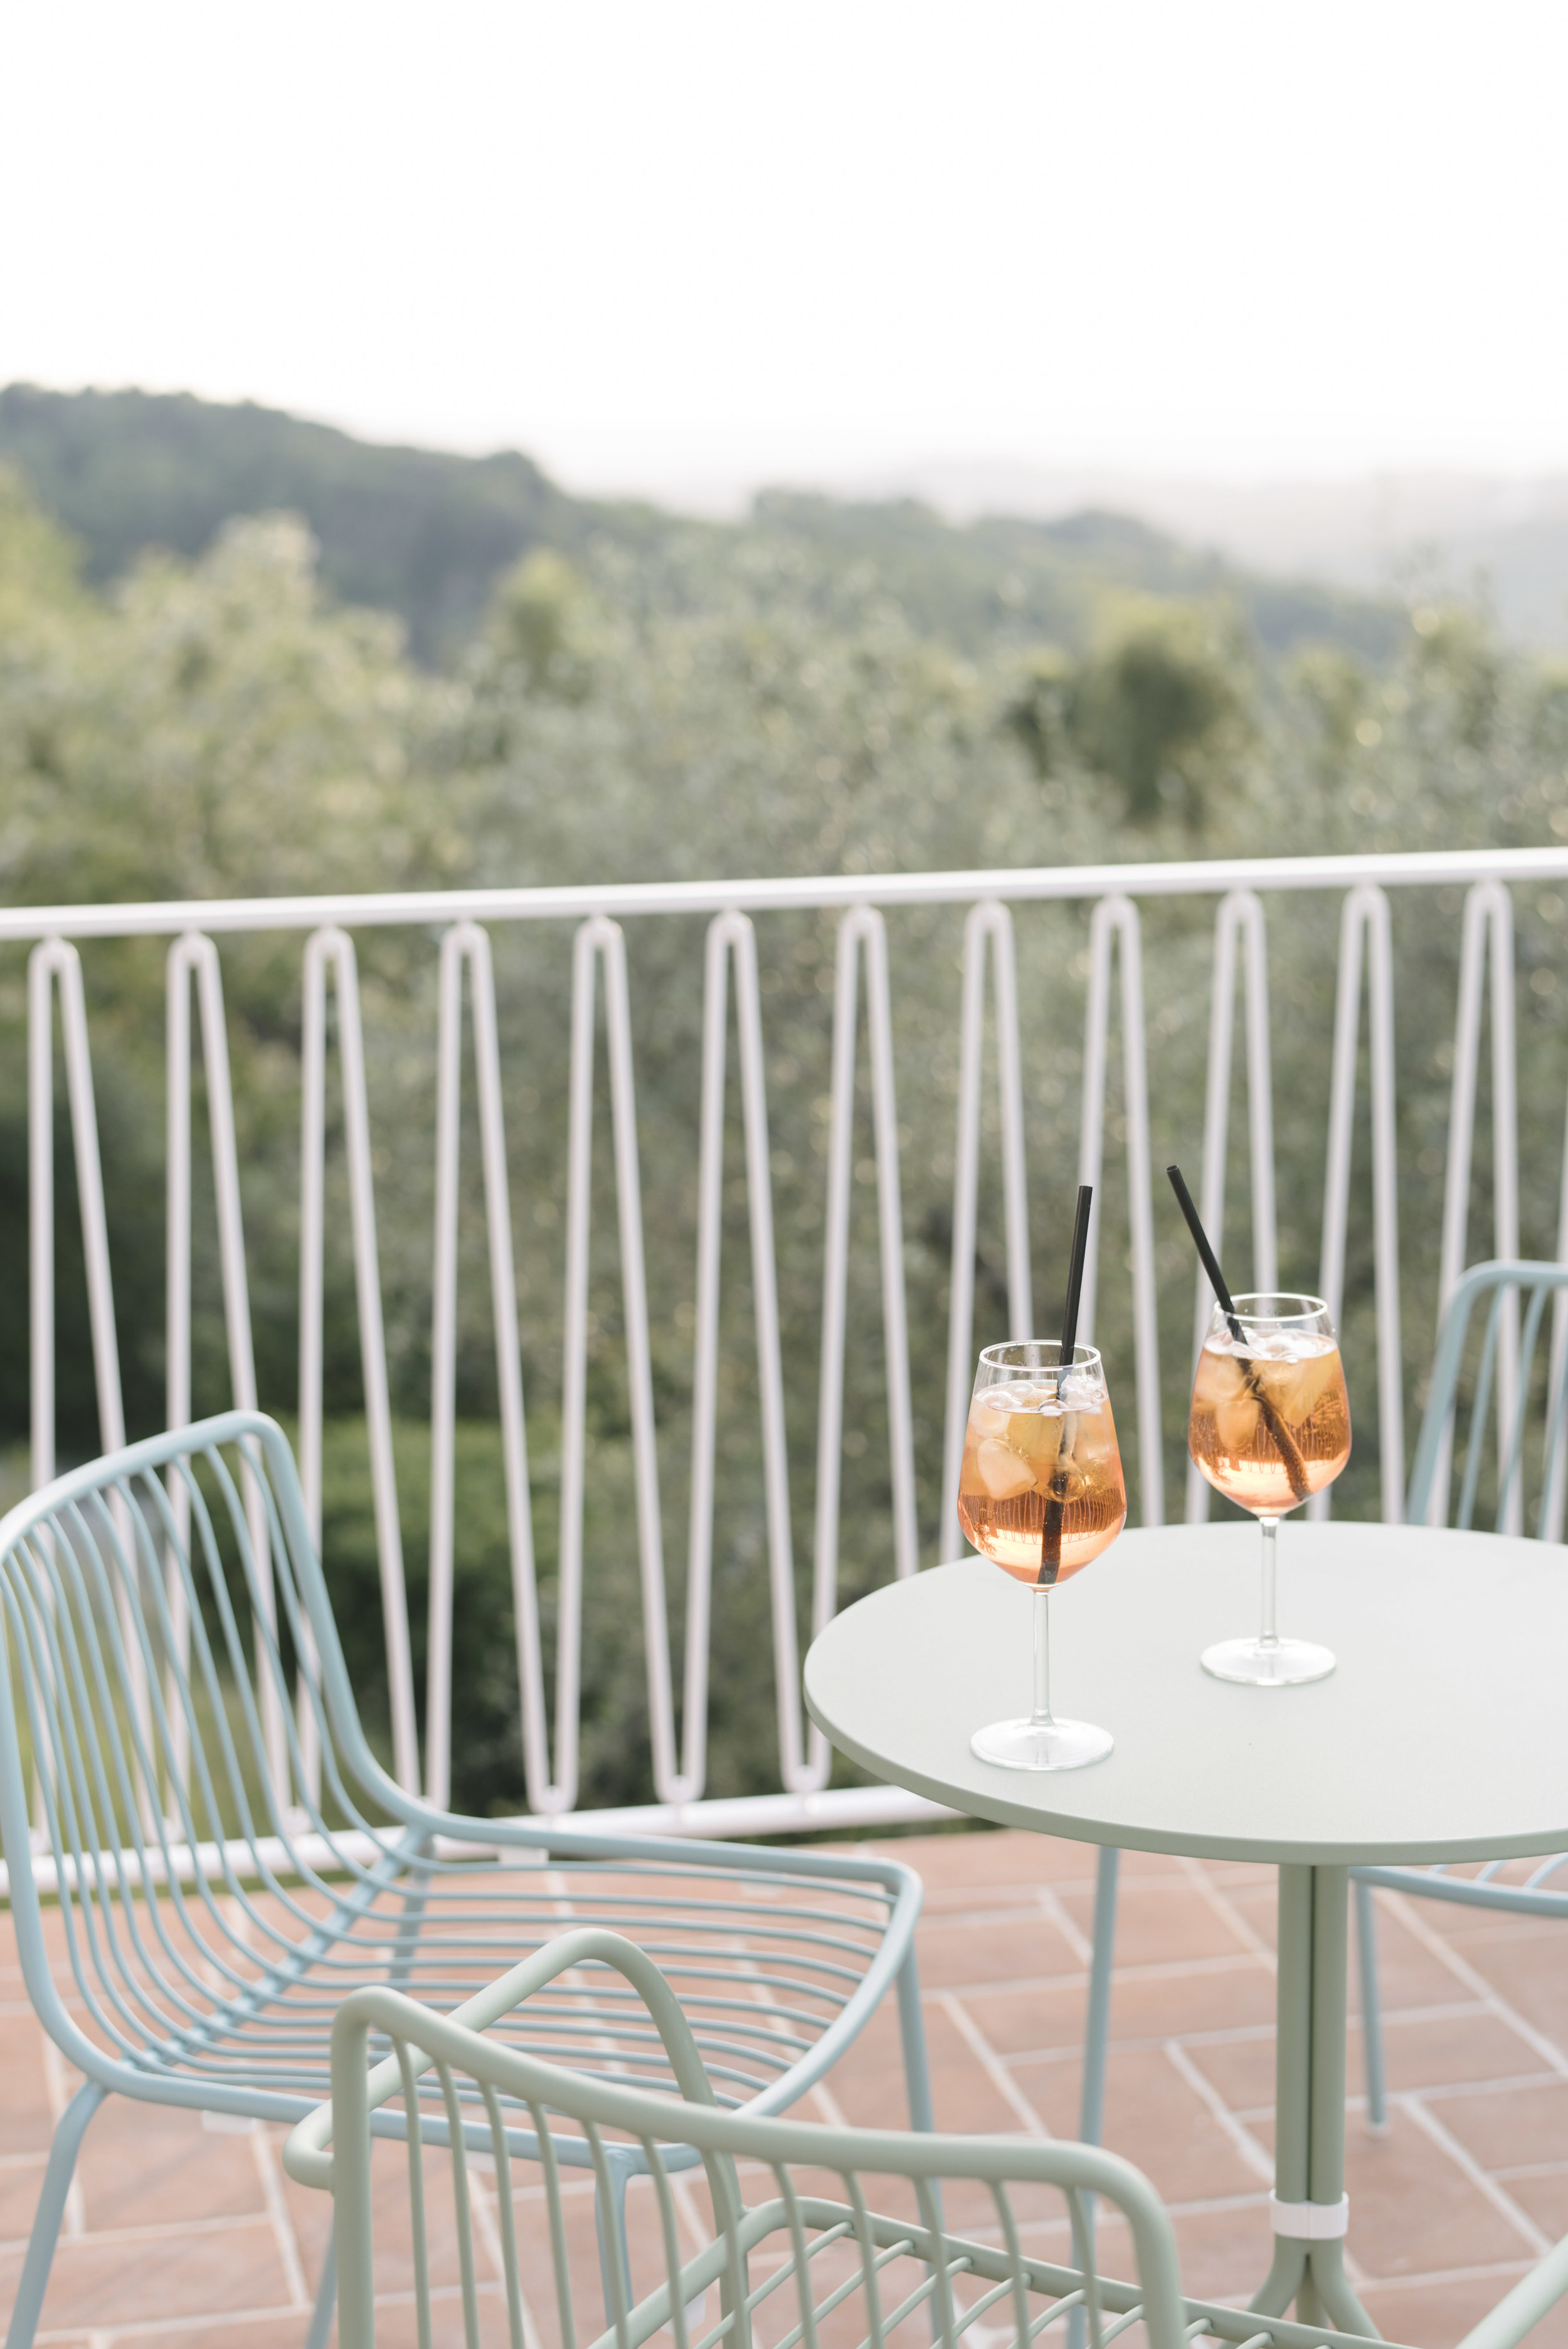 Villa+Lena,+Tuscany.+Olivia+Thébaut.jpg